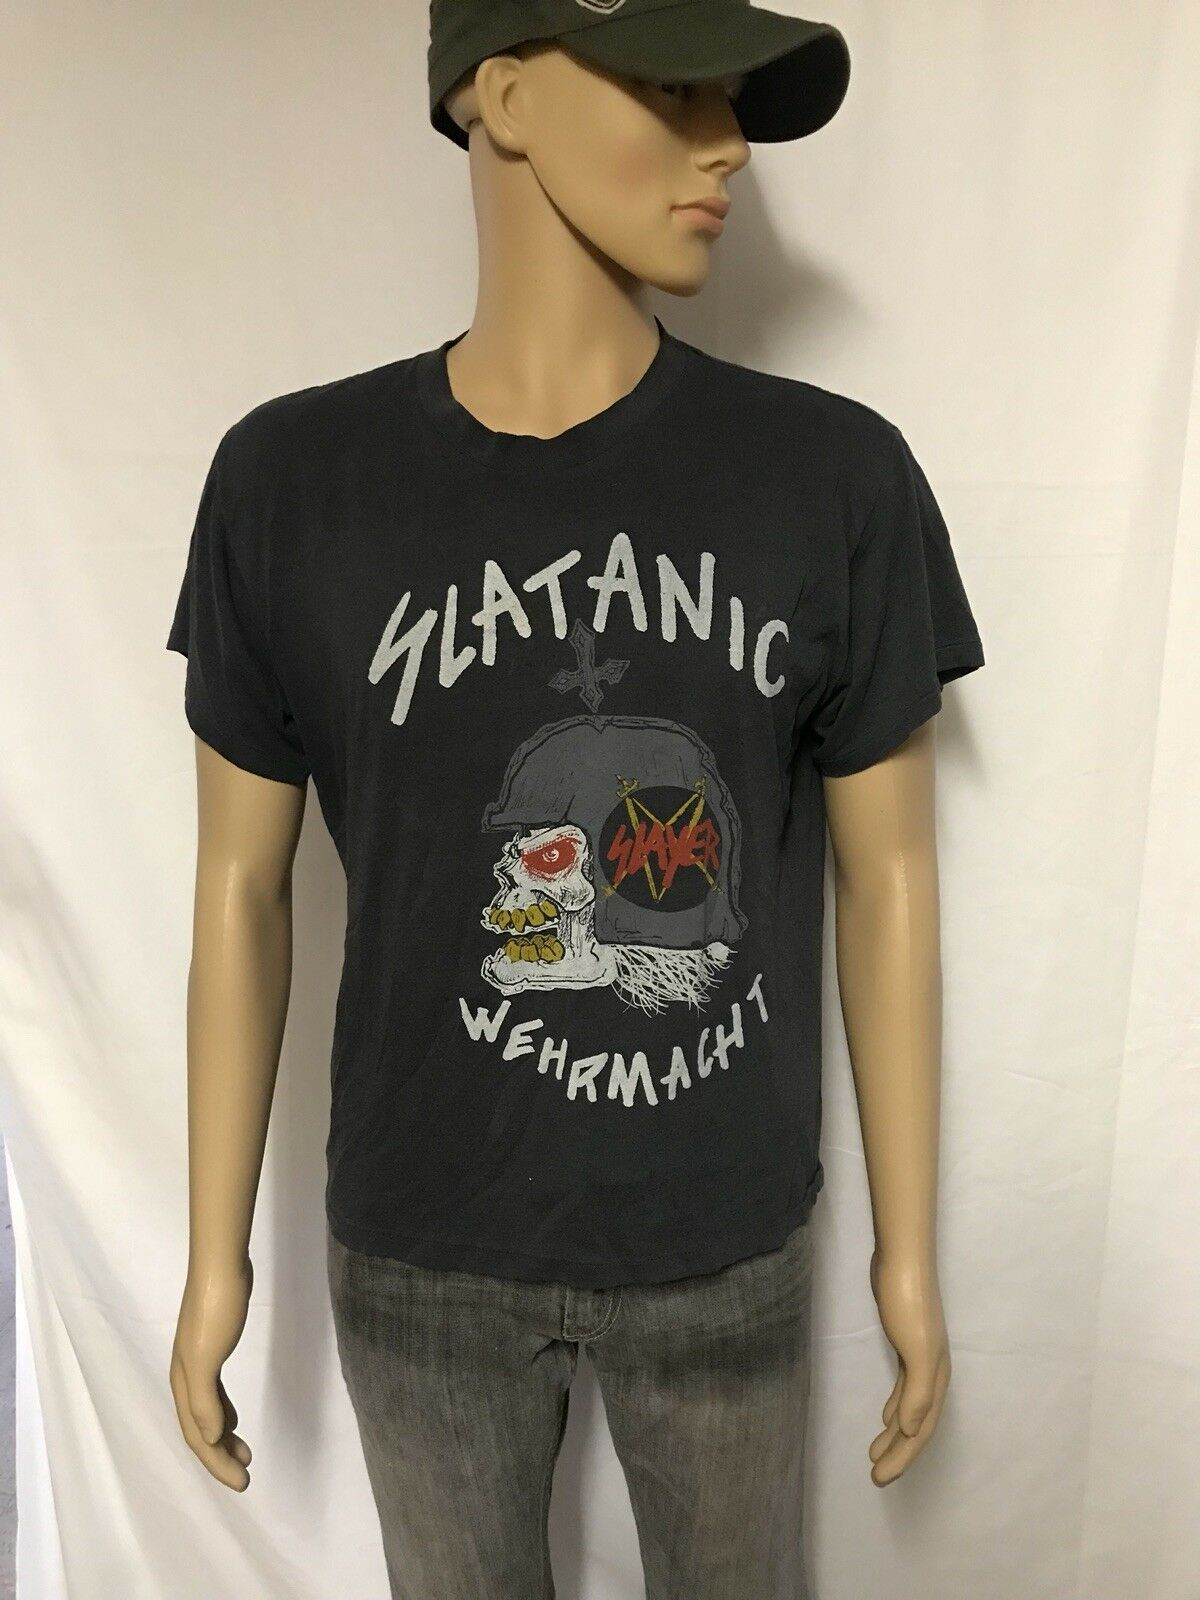 Vintage Slayer Slatanic Wehrmacht 1985 tour shirt original Thrash Metal